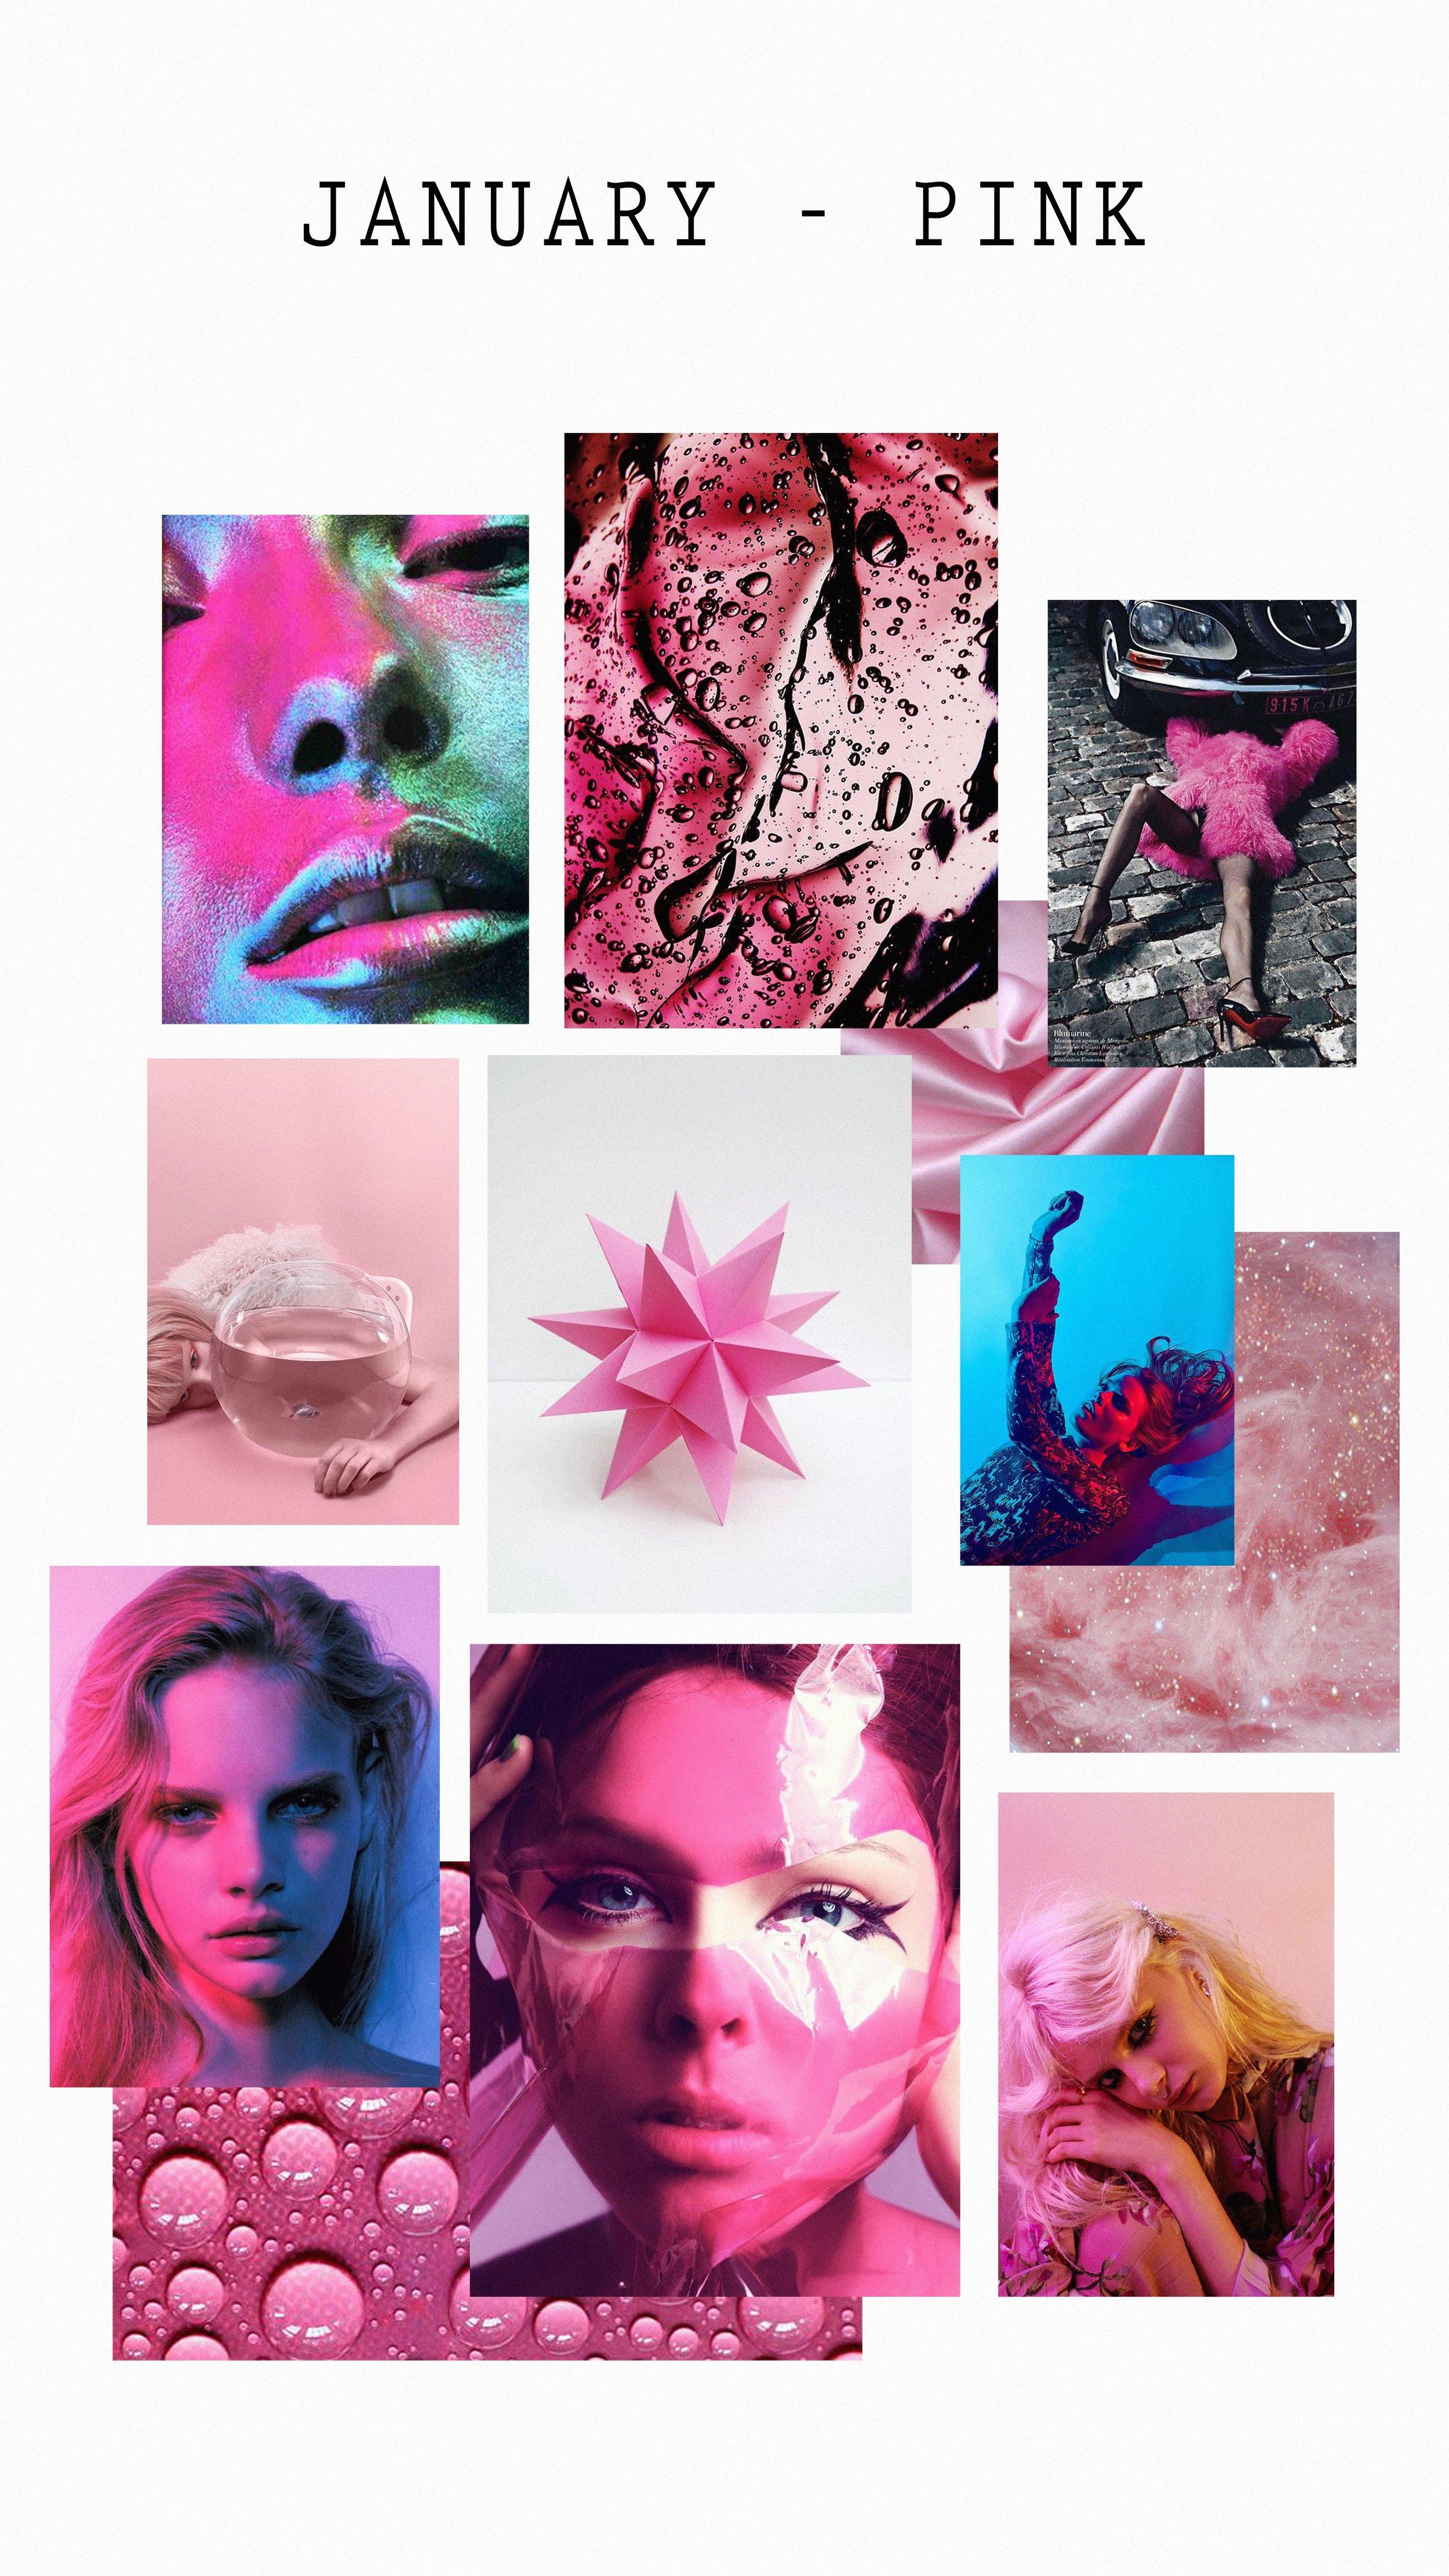 JAN - PINK.jpg